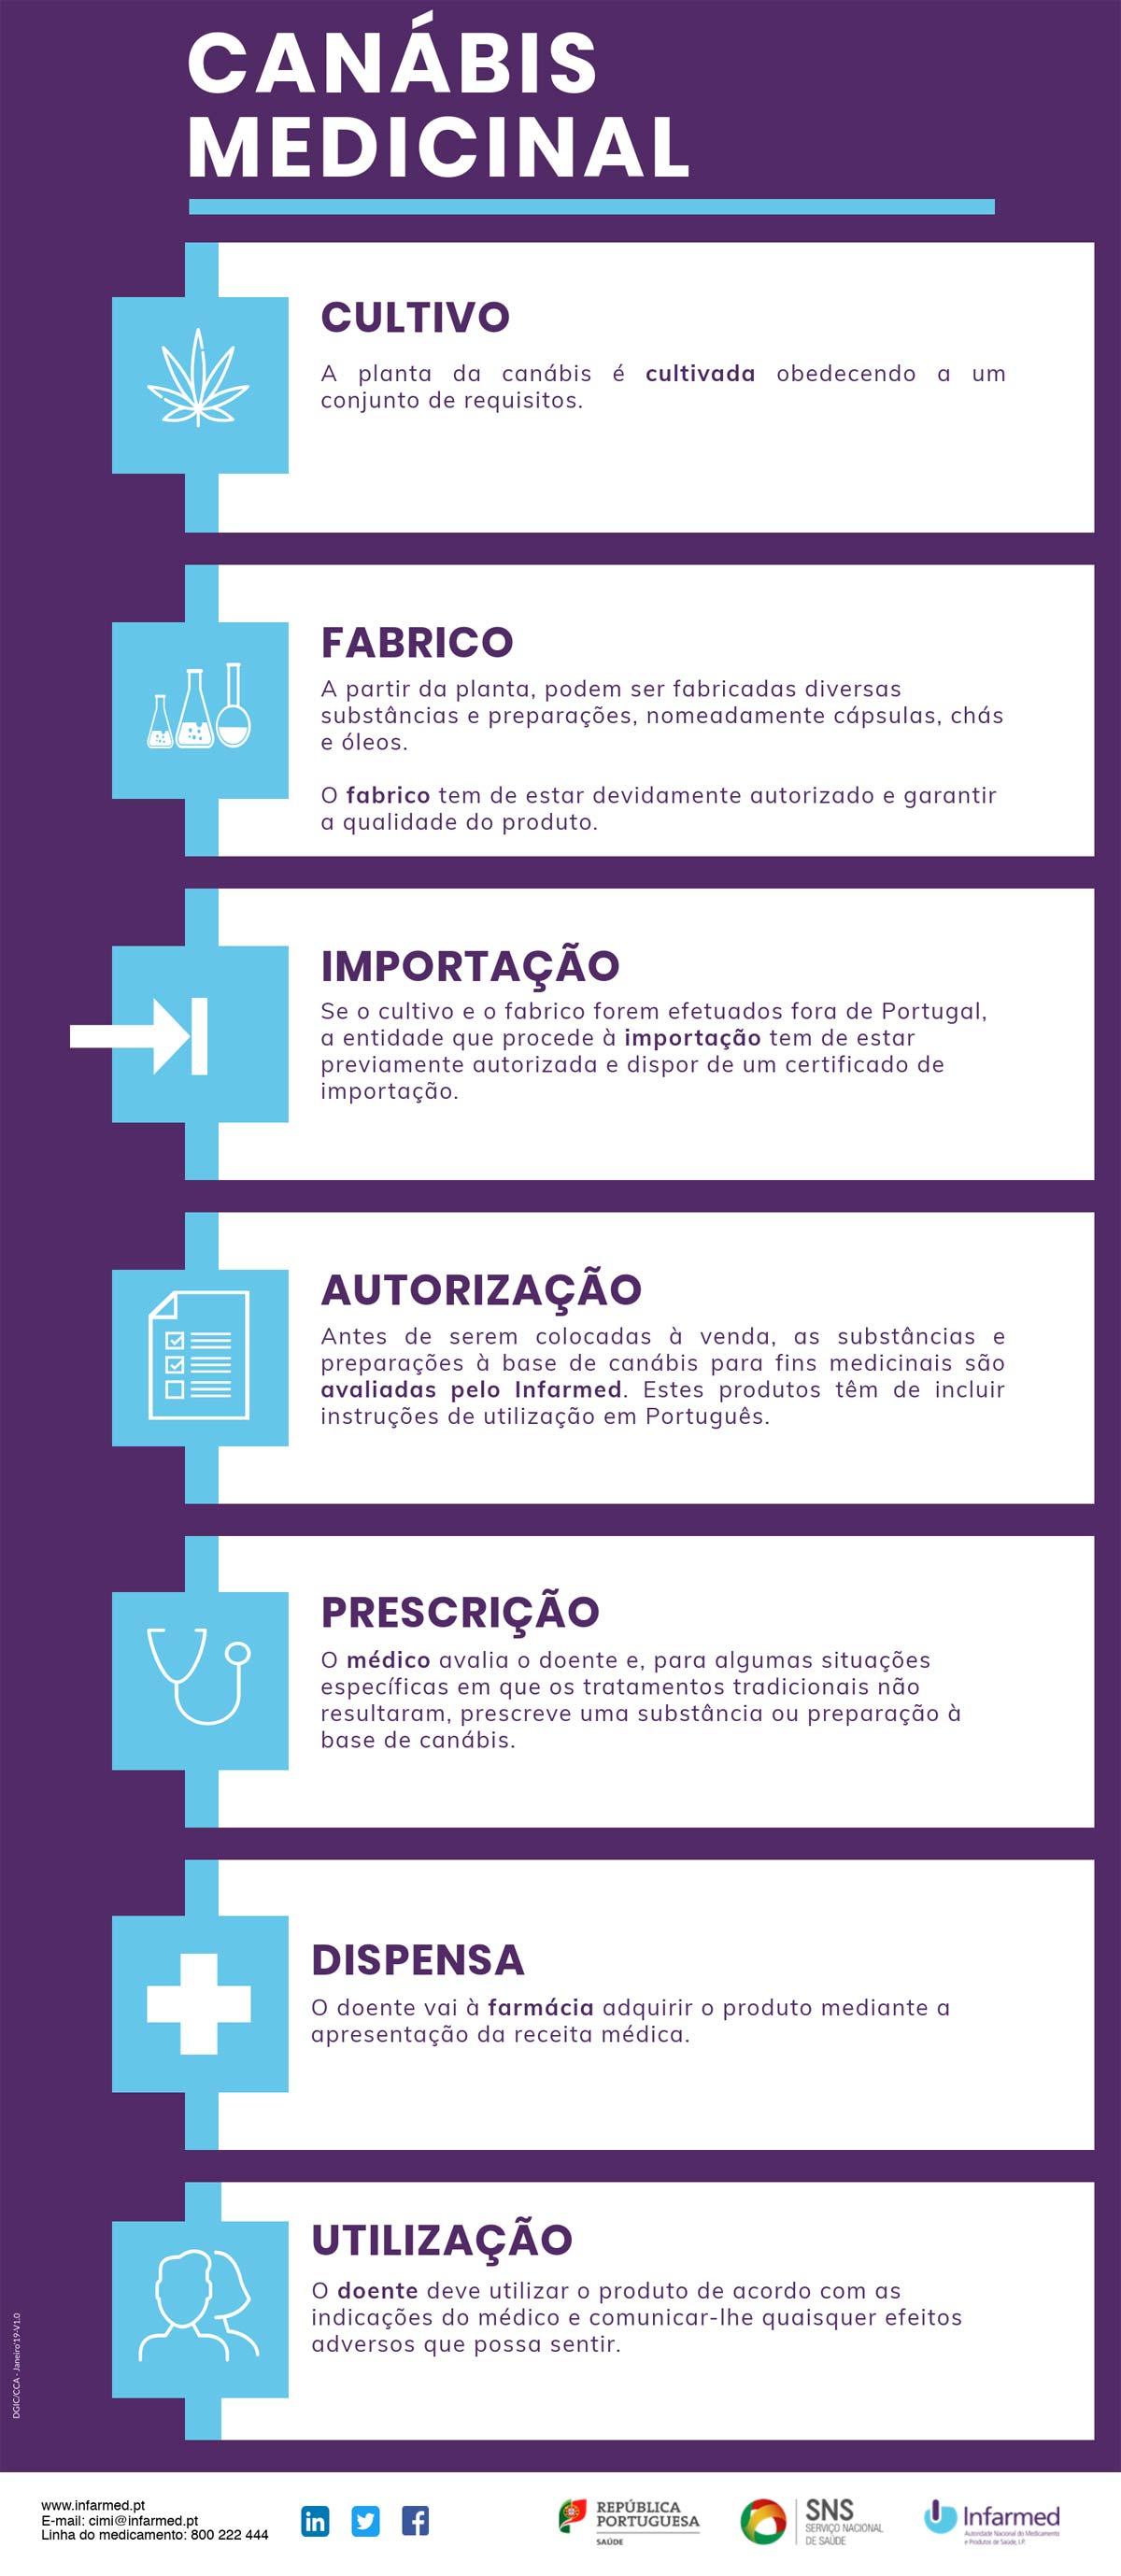 Infografia canábis medicinal. Fonte: Infarmed